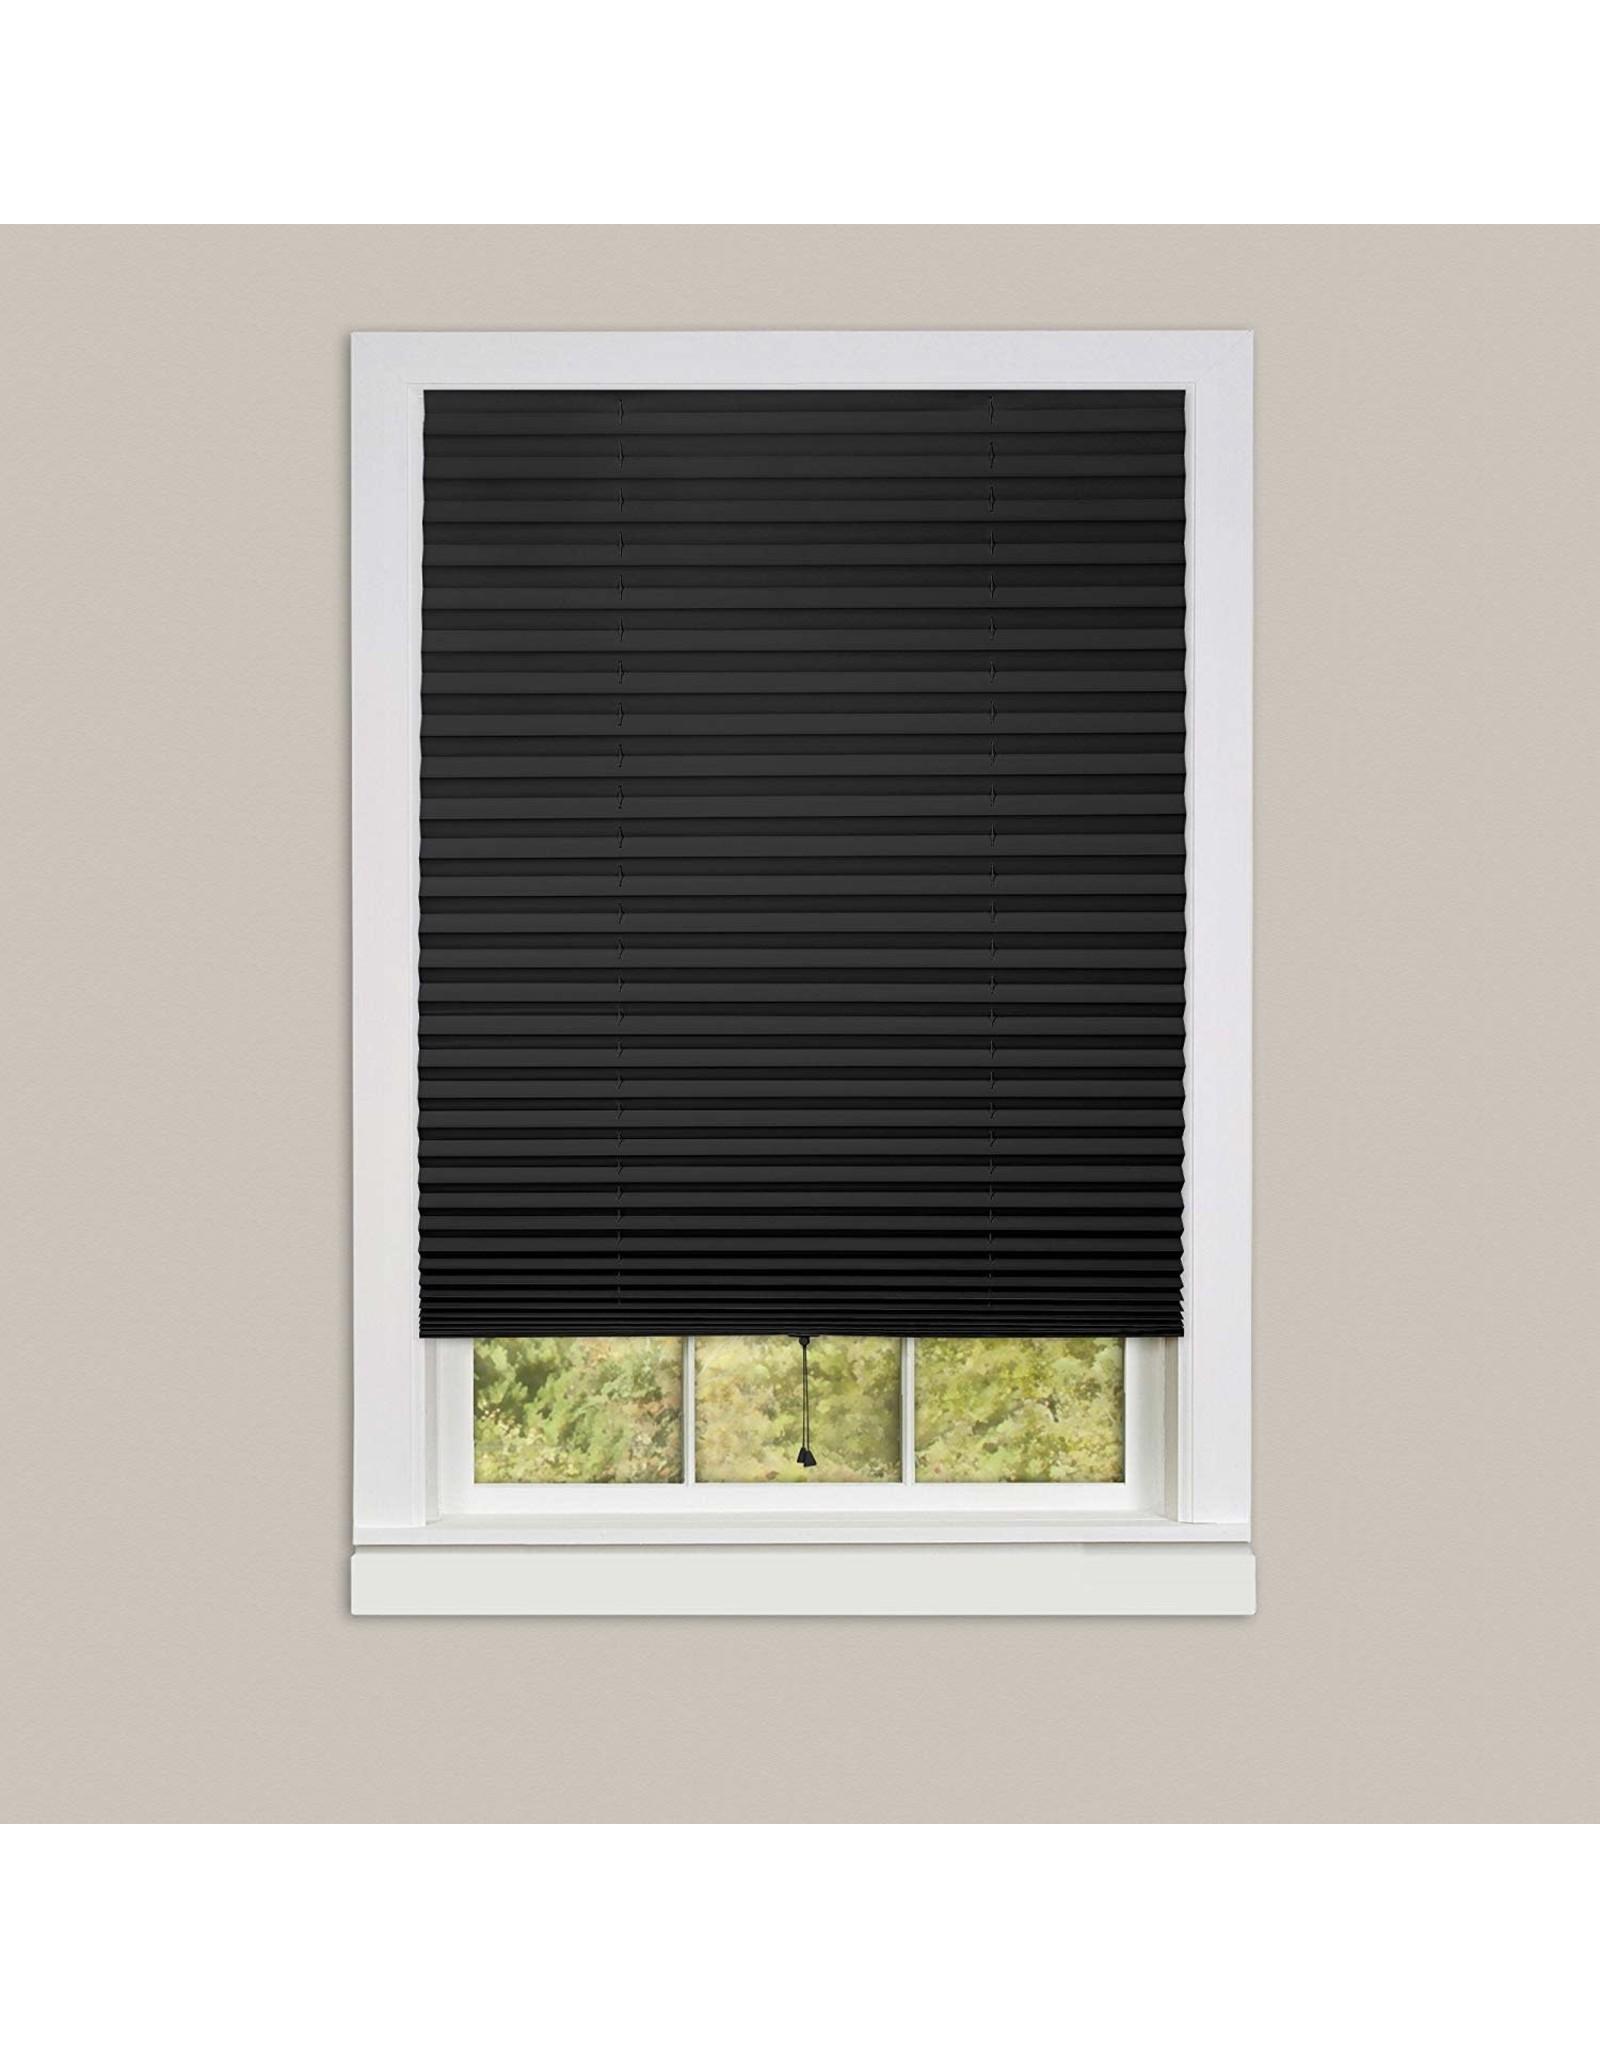 WINDOW SHADE-PLEATED-36x75-BLACK 123